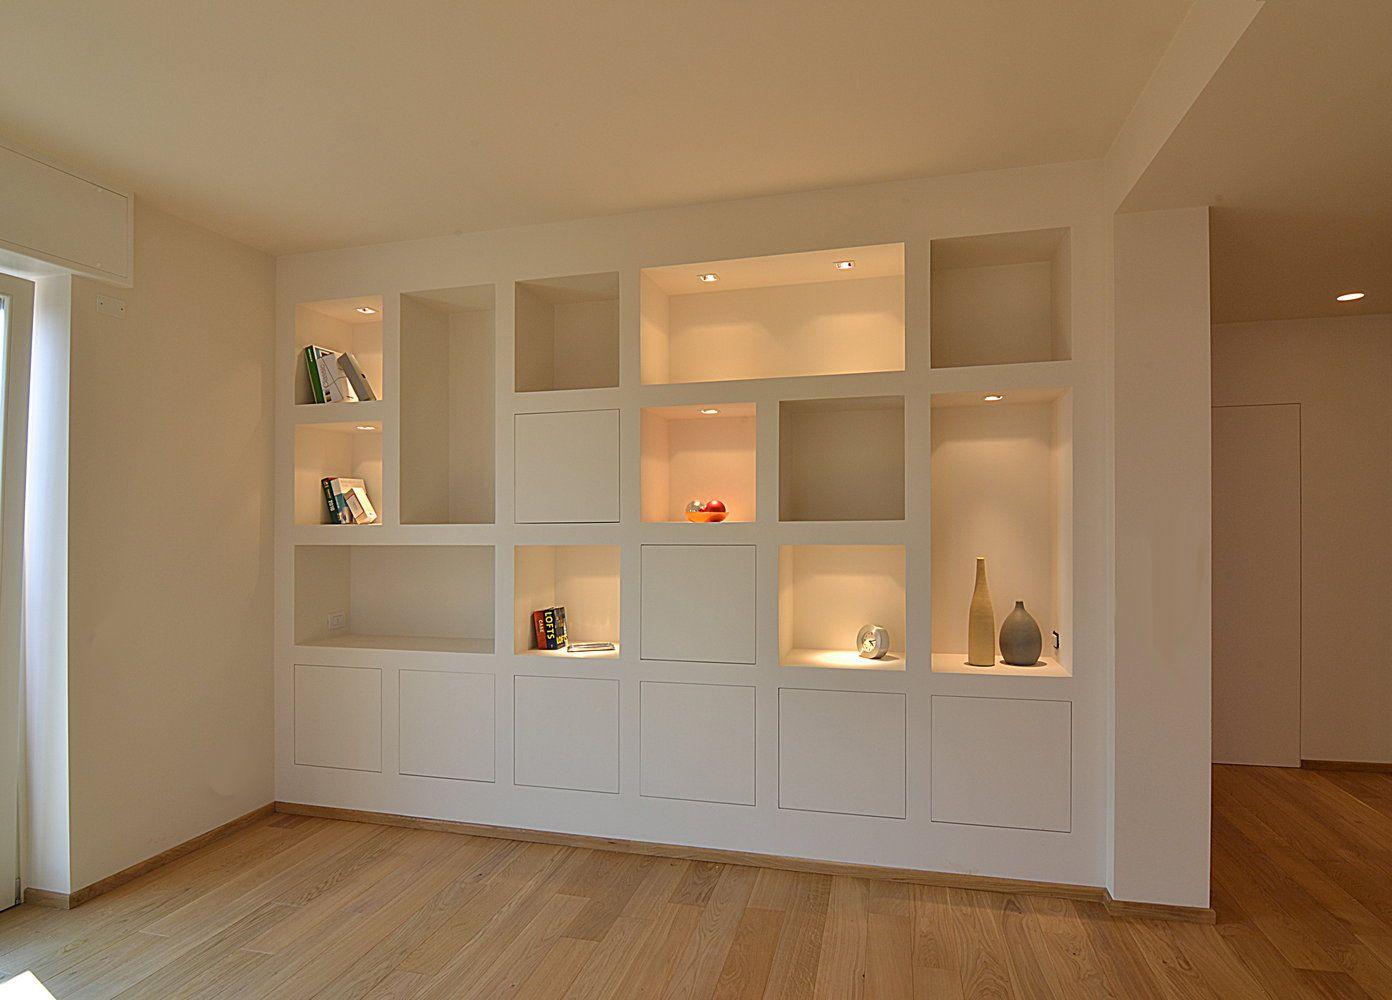 02 sala bianchibosoni hogar almacenamiento en el for Pareti sala in cartongesso